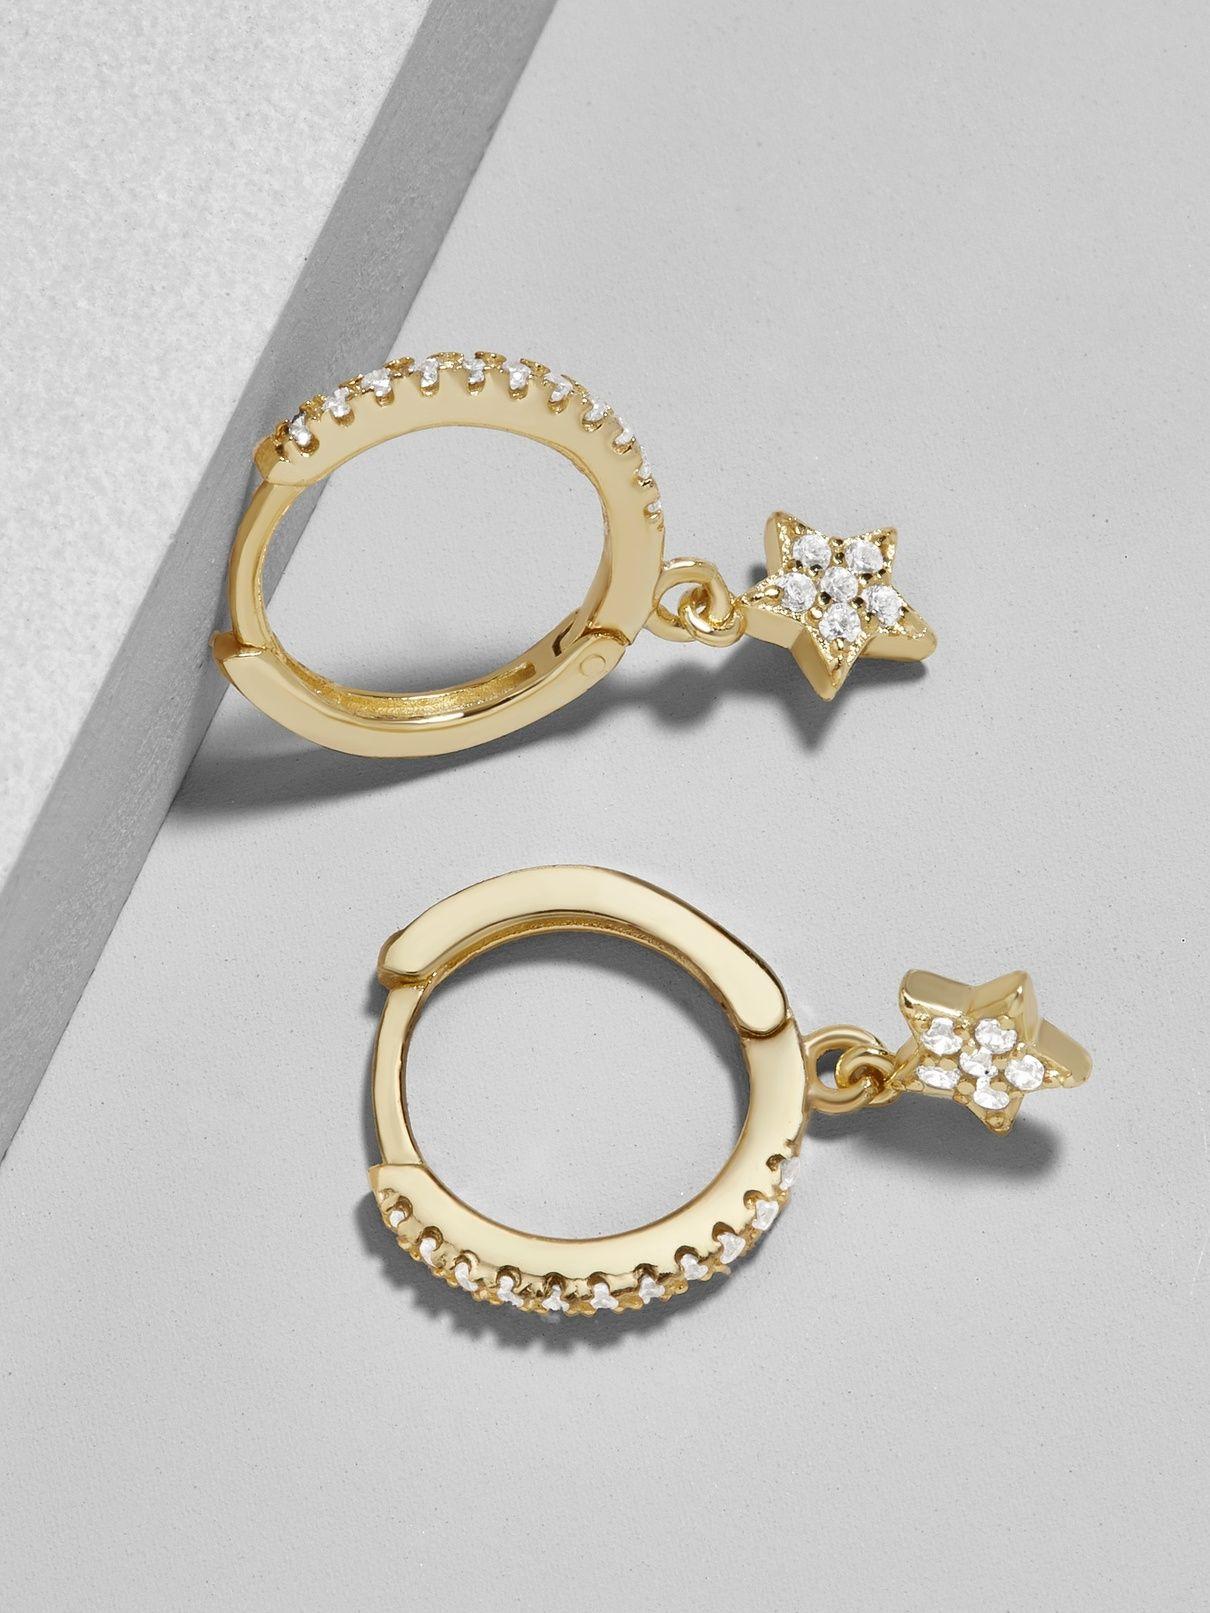 351a9c2fb Stella 18K Gold Plated Huggie Hoop Earrings | Things I want as gifts ...